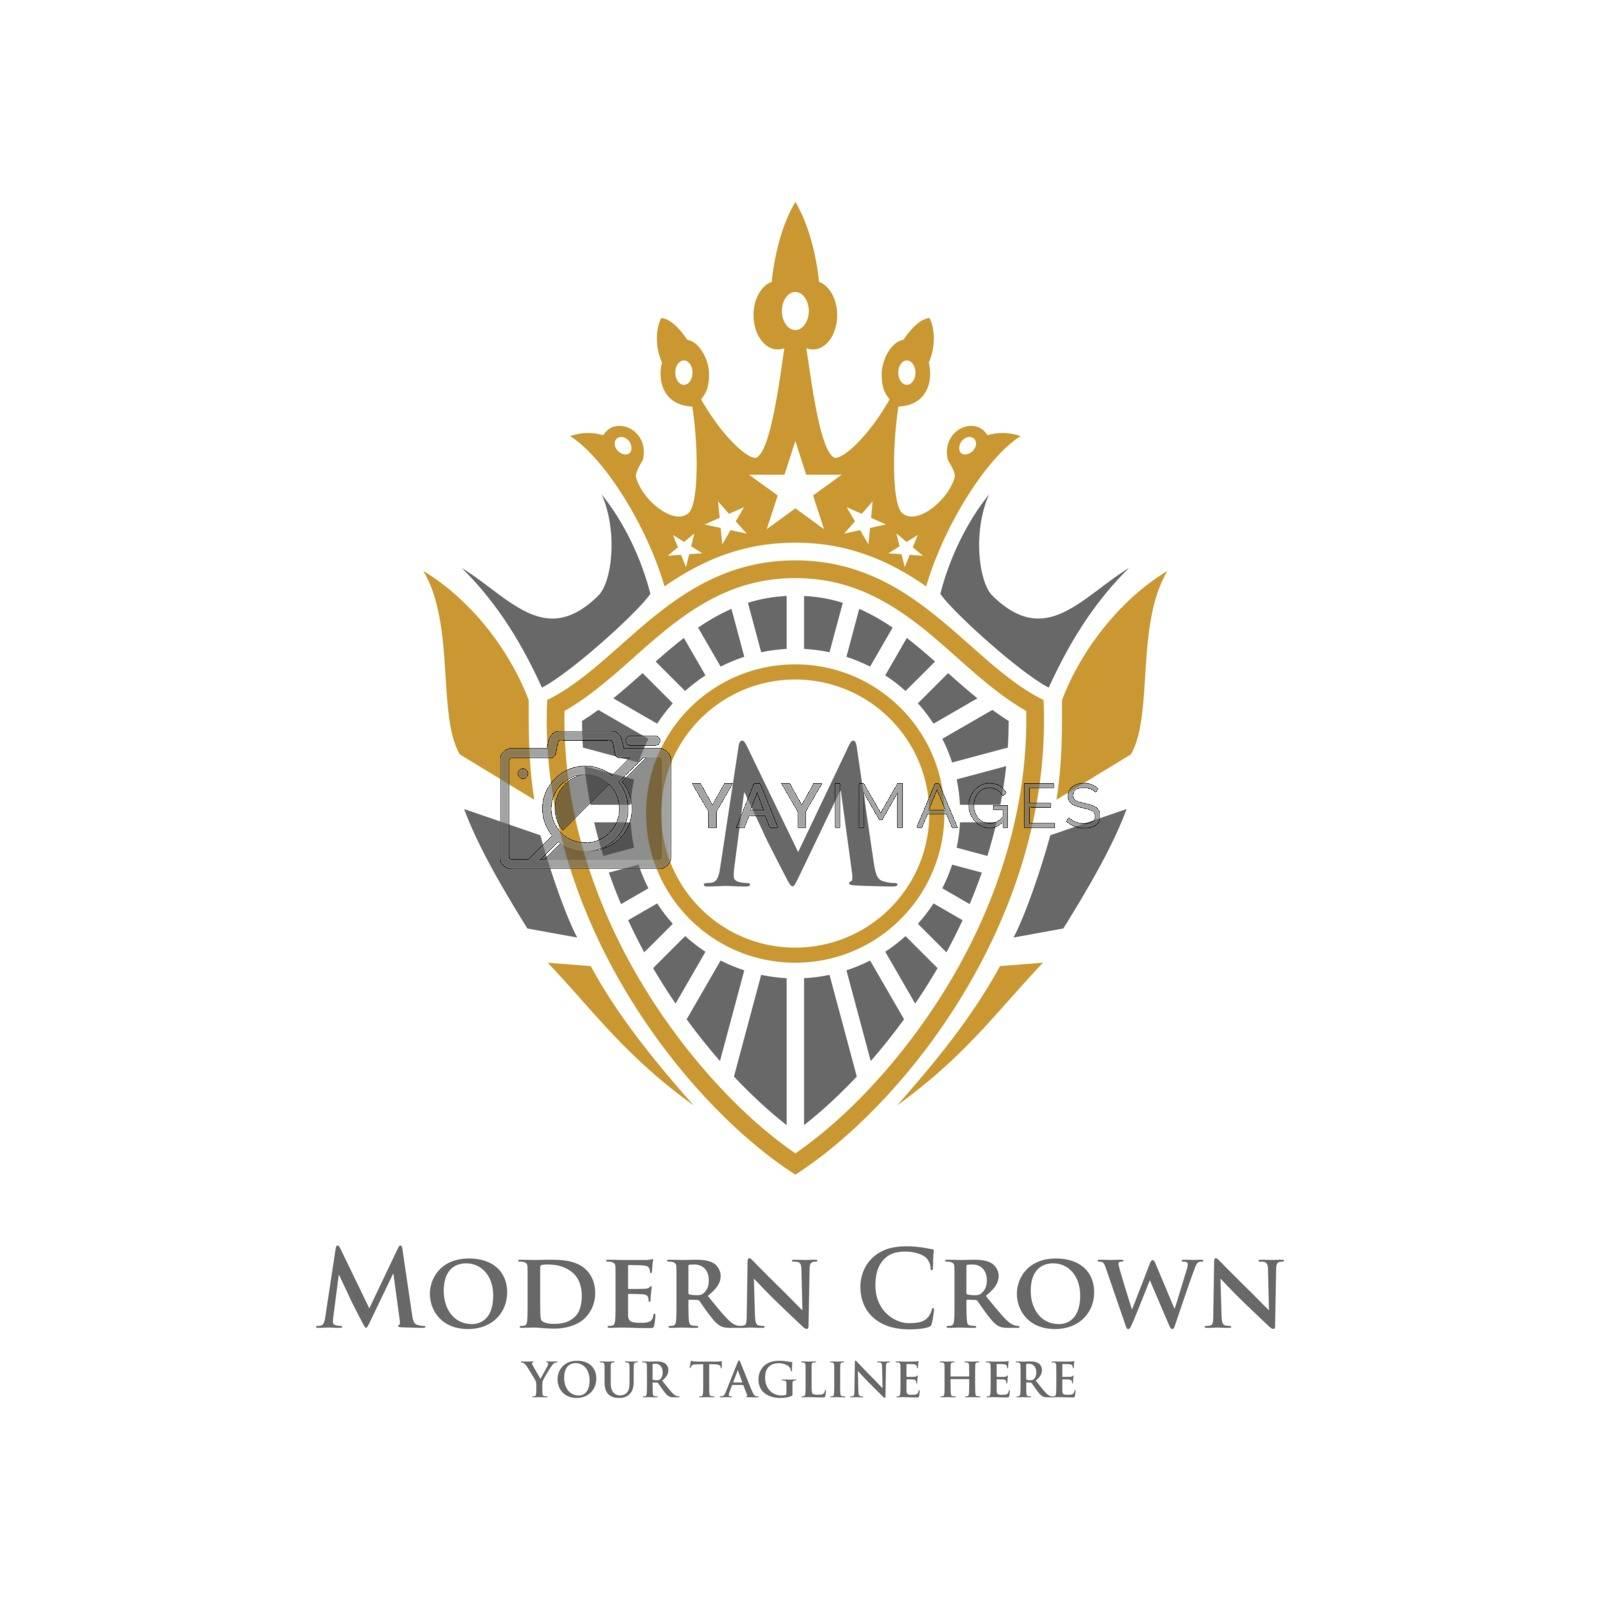 Heraldry Typography Vector Logo Design with Luxury Crown Decorative Frame